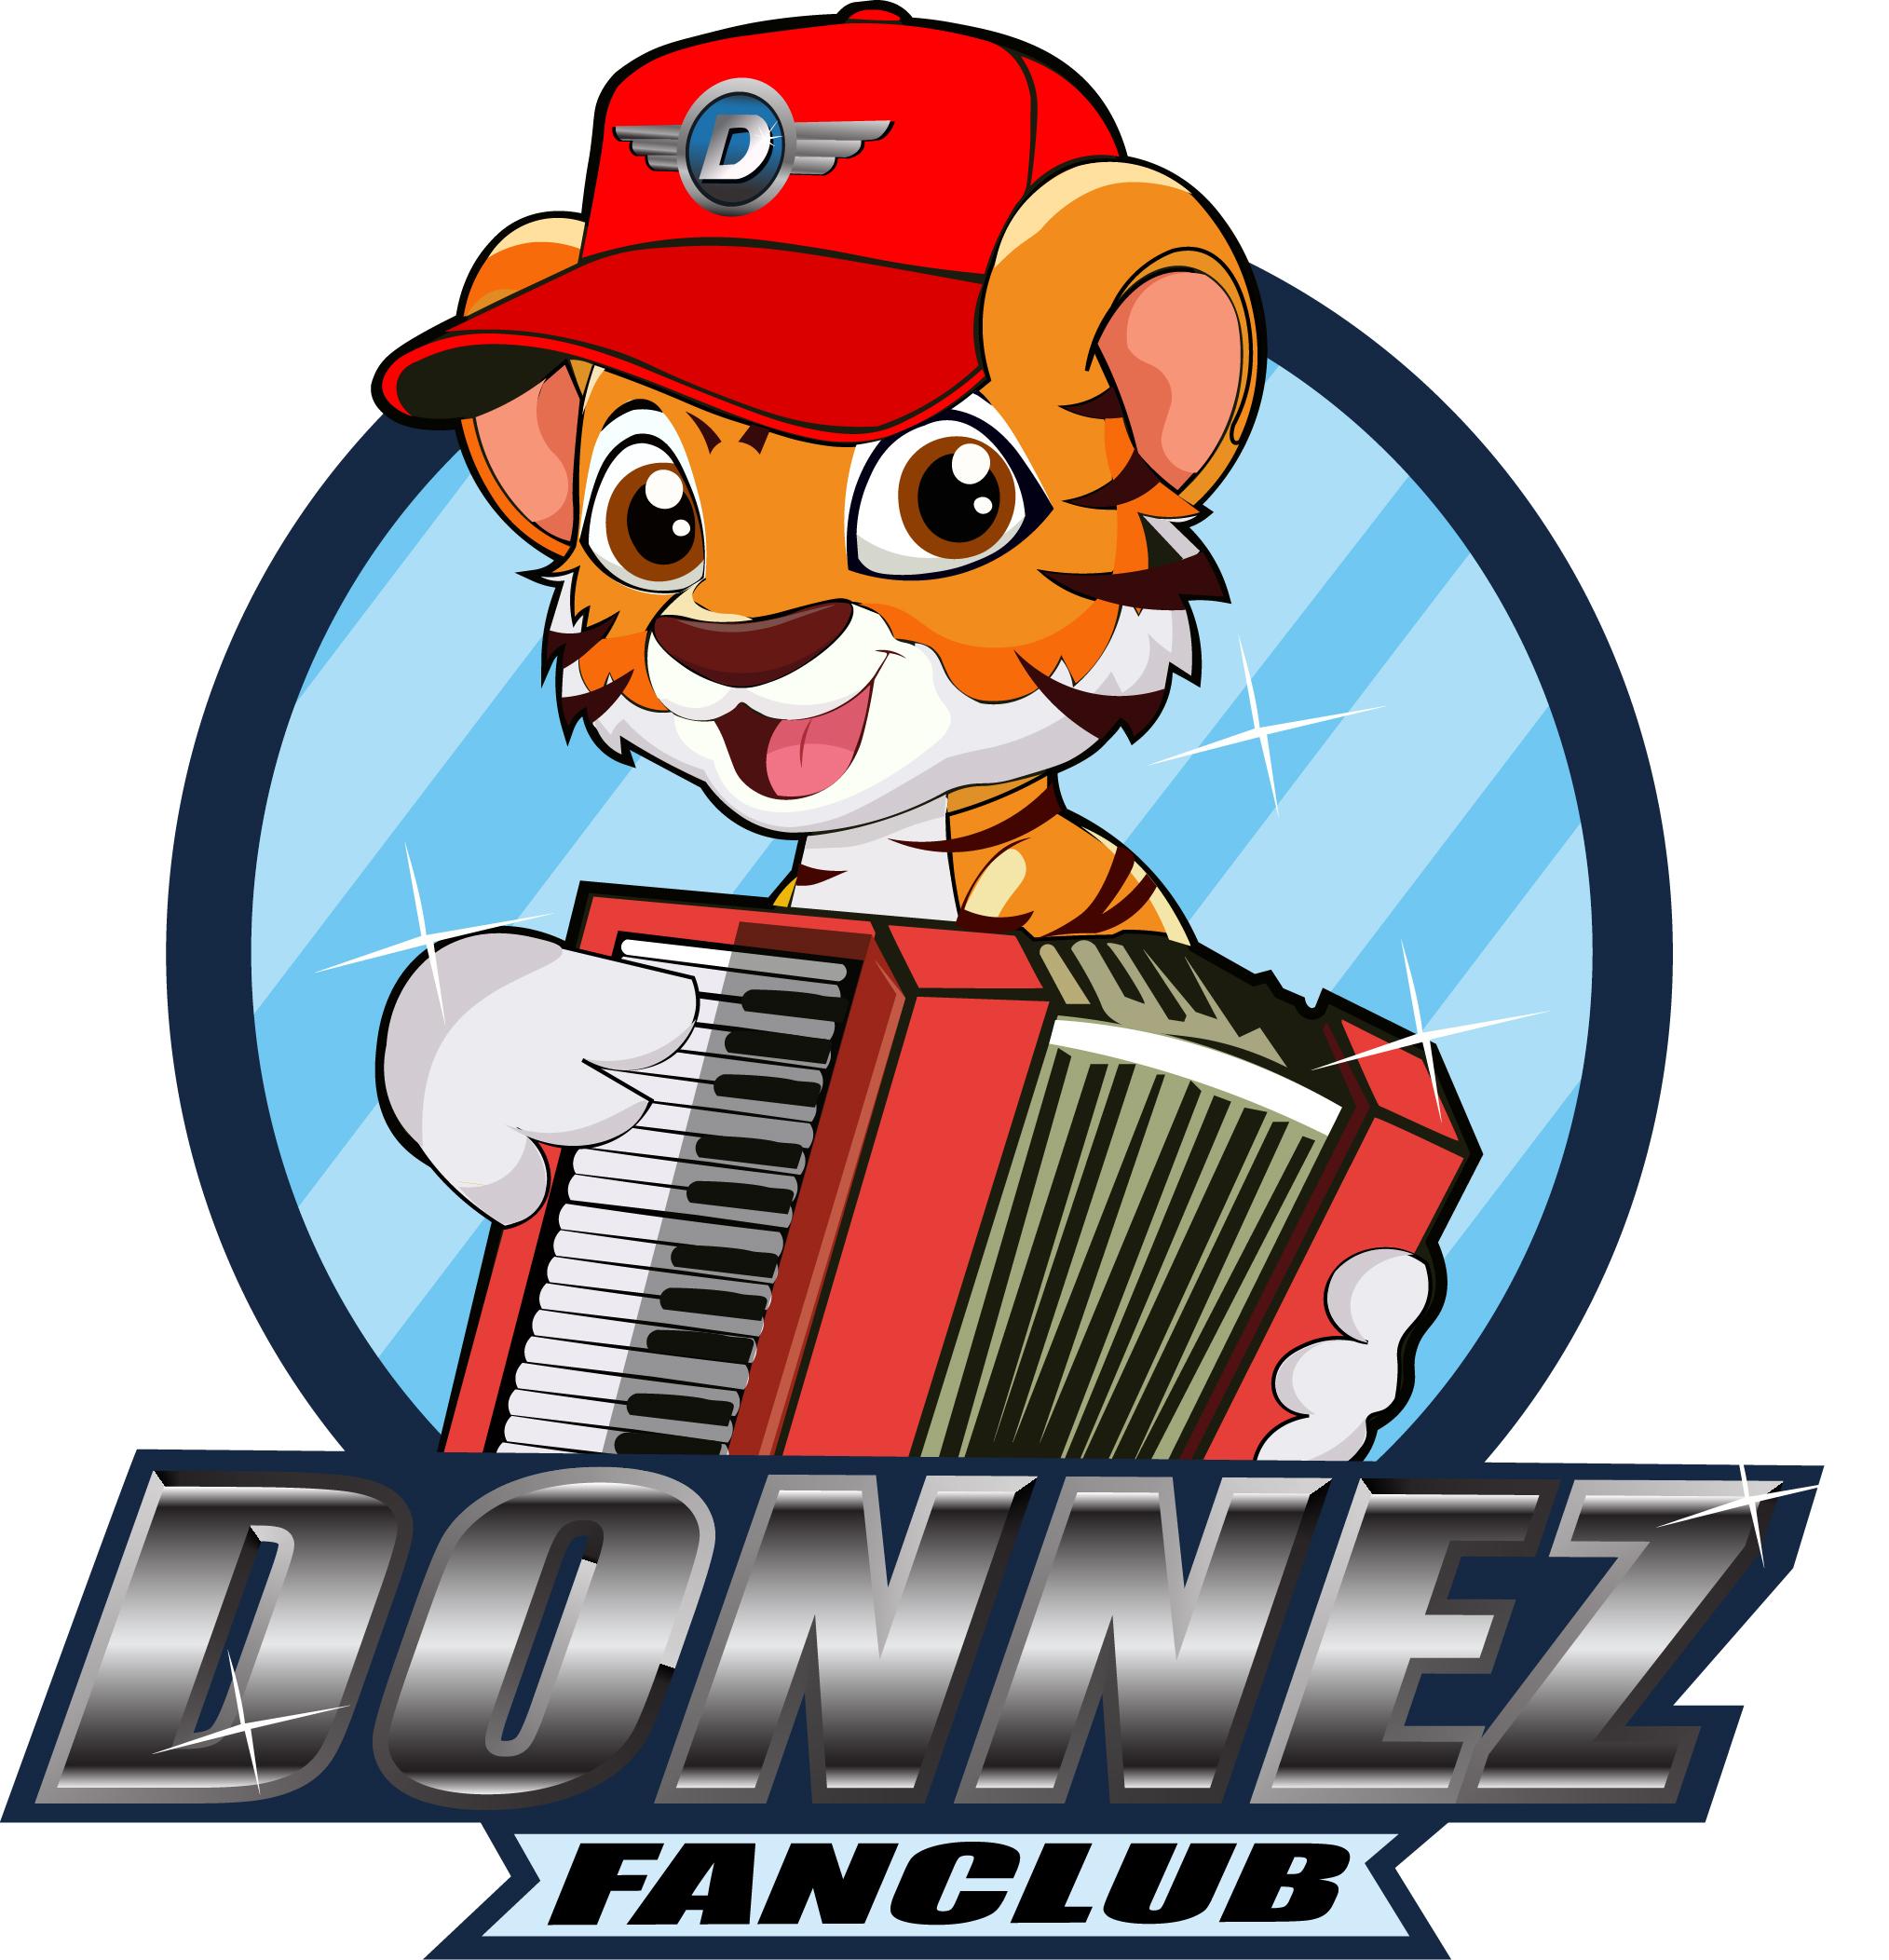 Medlemskap i Donnez Fanclub